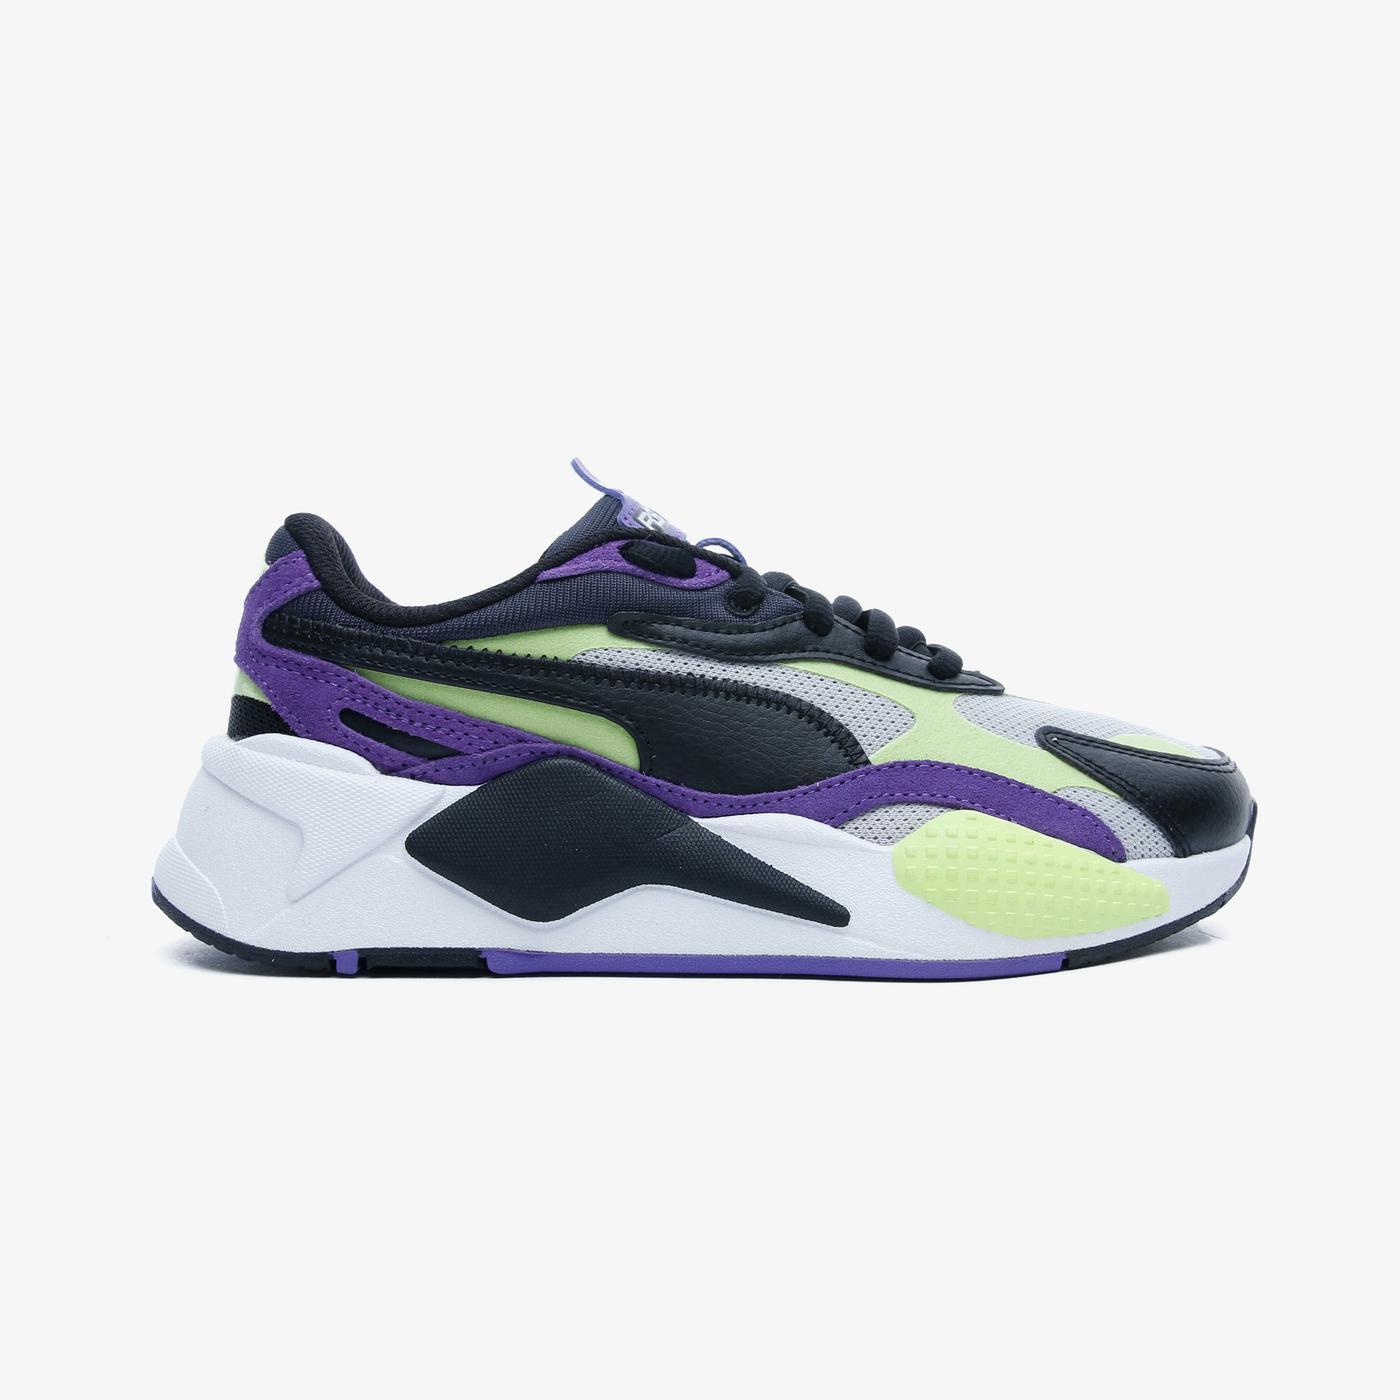 Puma RS-X³ Bright Kadın Spor Ayakkabı